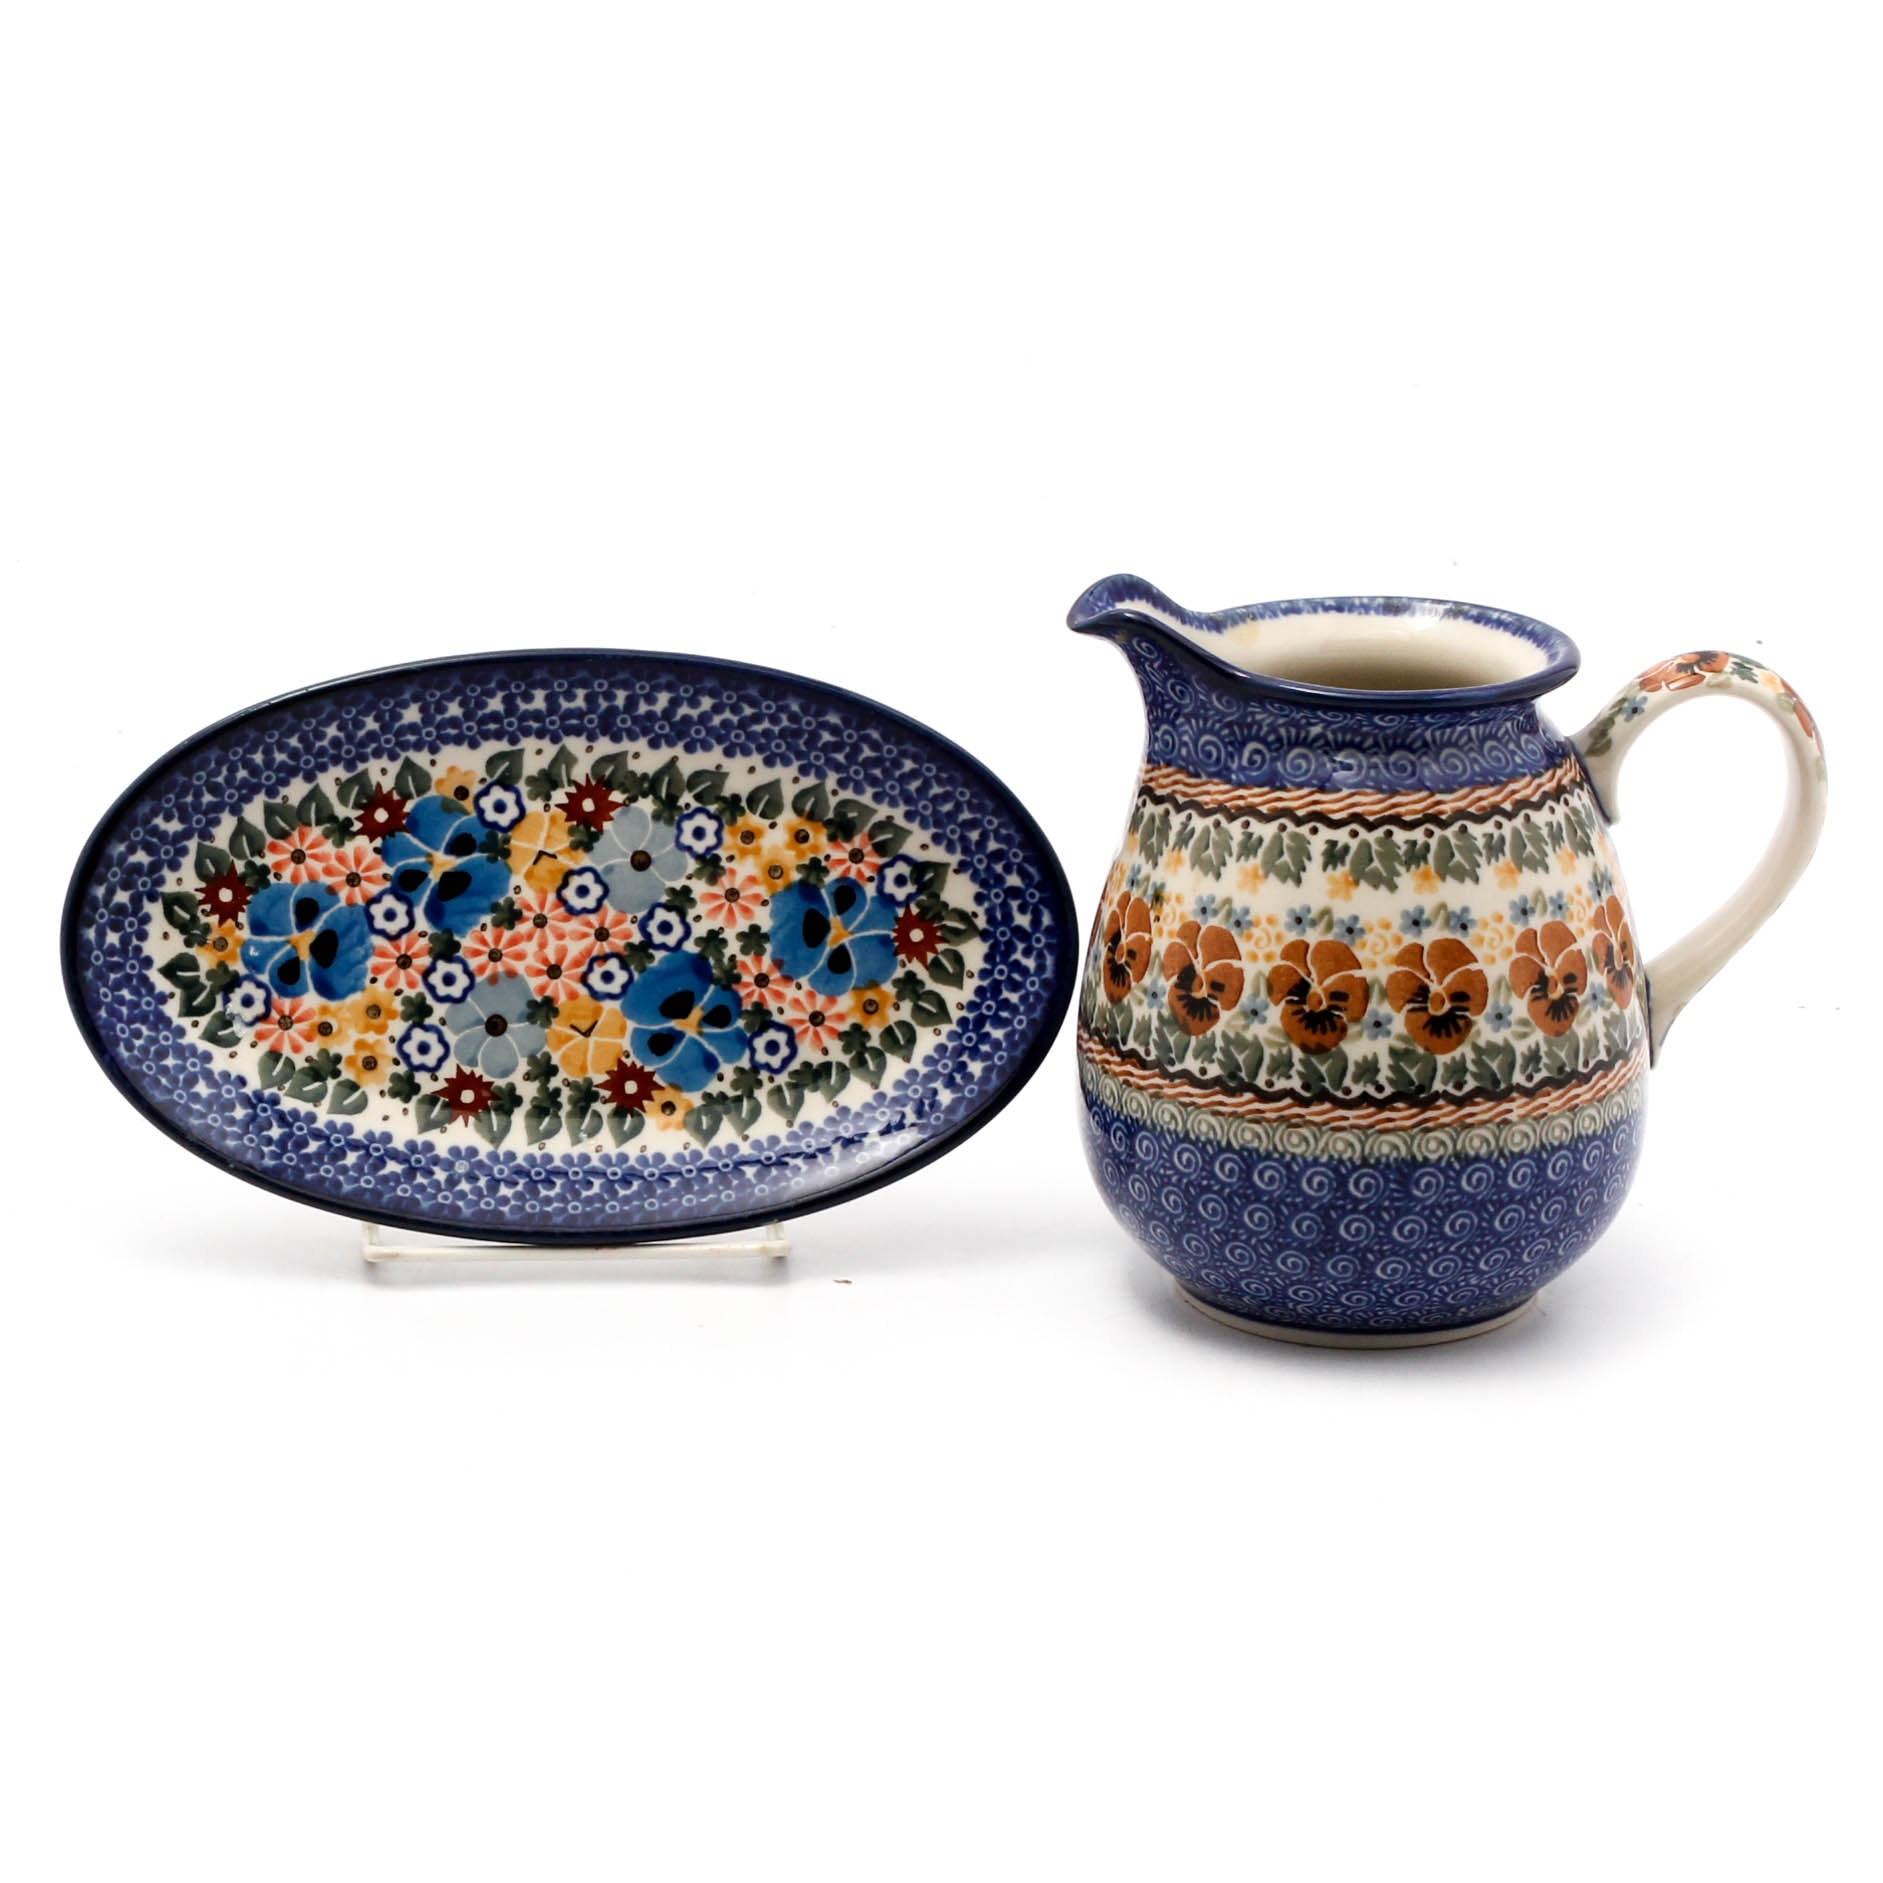 Hand-Painted Polish Unikat Pottery by Maria Starzyk